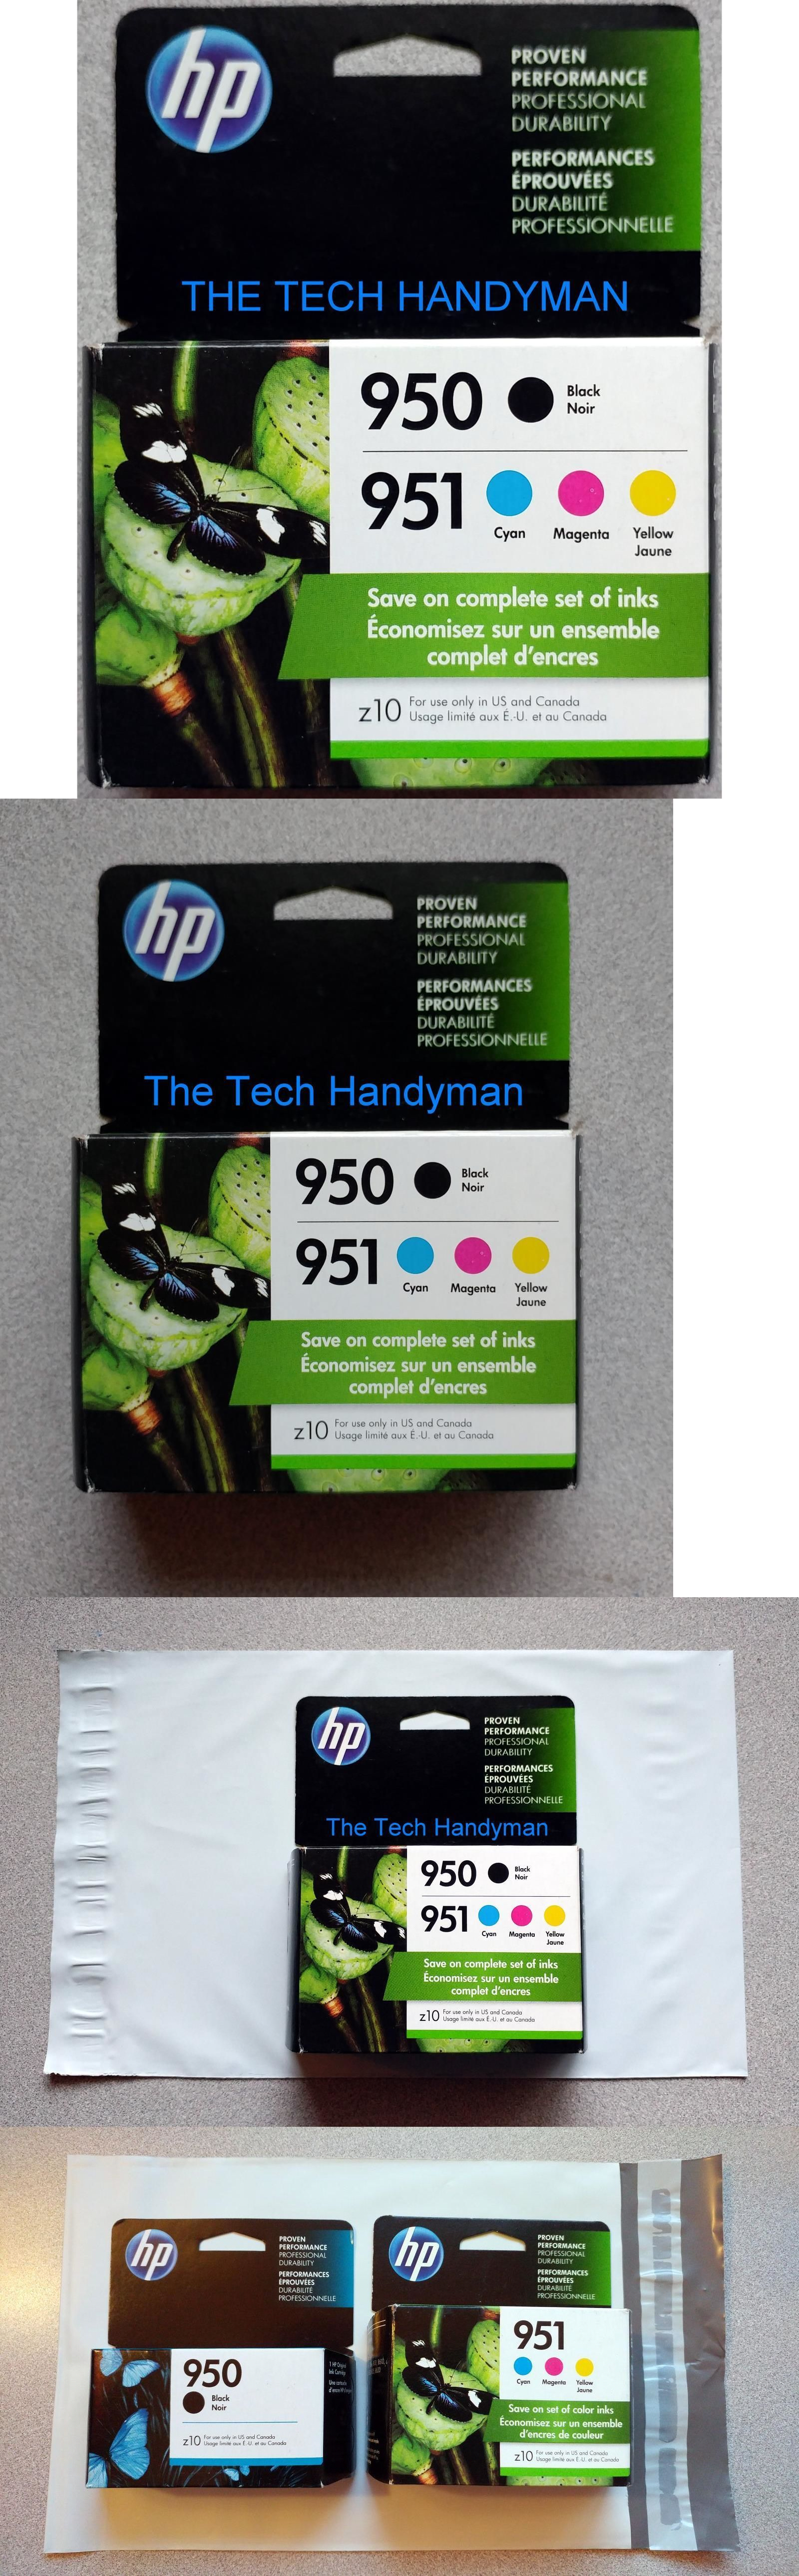 HP 950XL BLACK /& 951 COLOR INK OFFICEJET PRO 8600 GENUINE NEW OEM RETAIL BOX